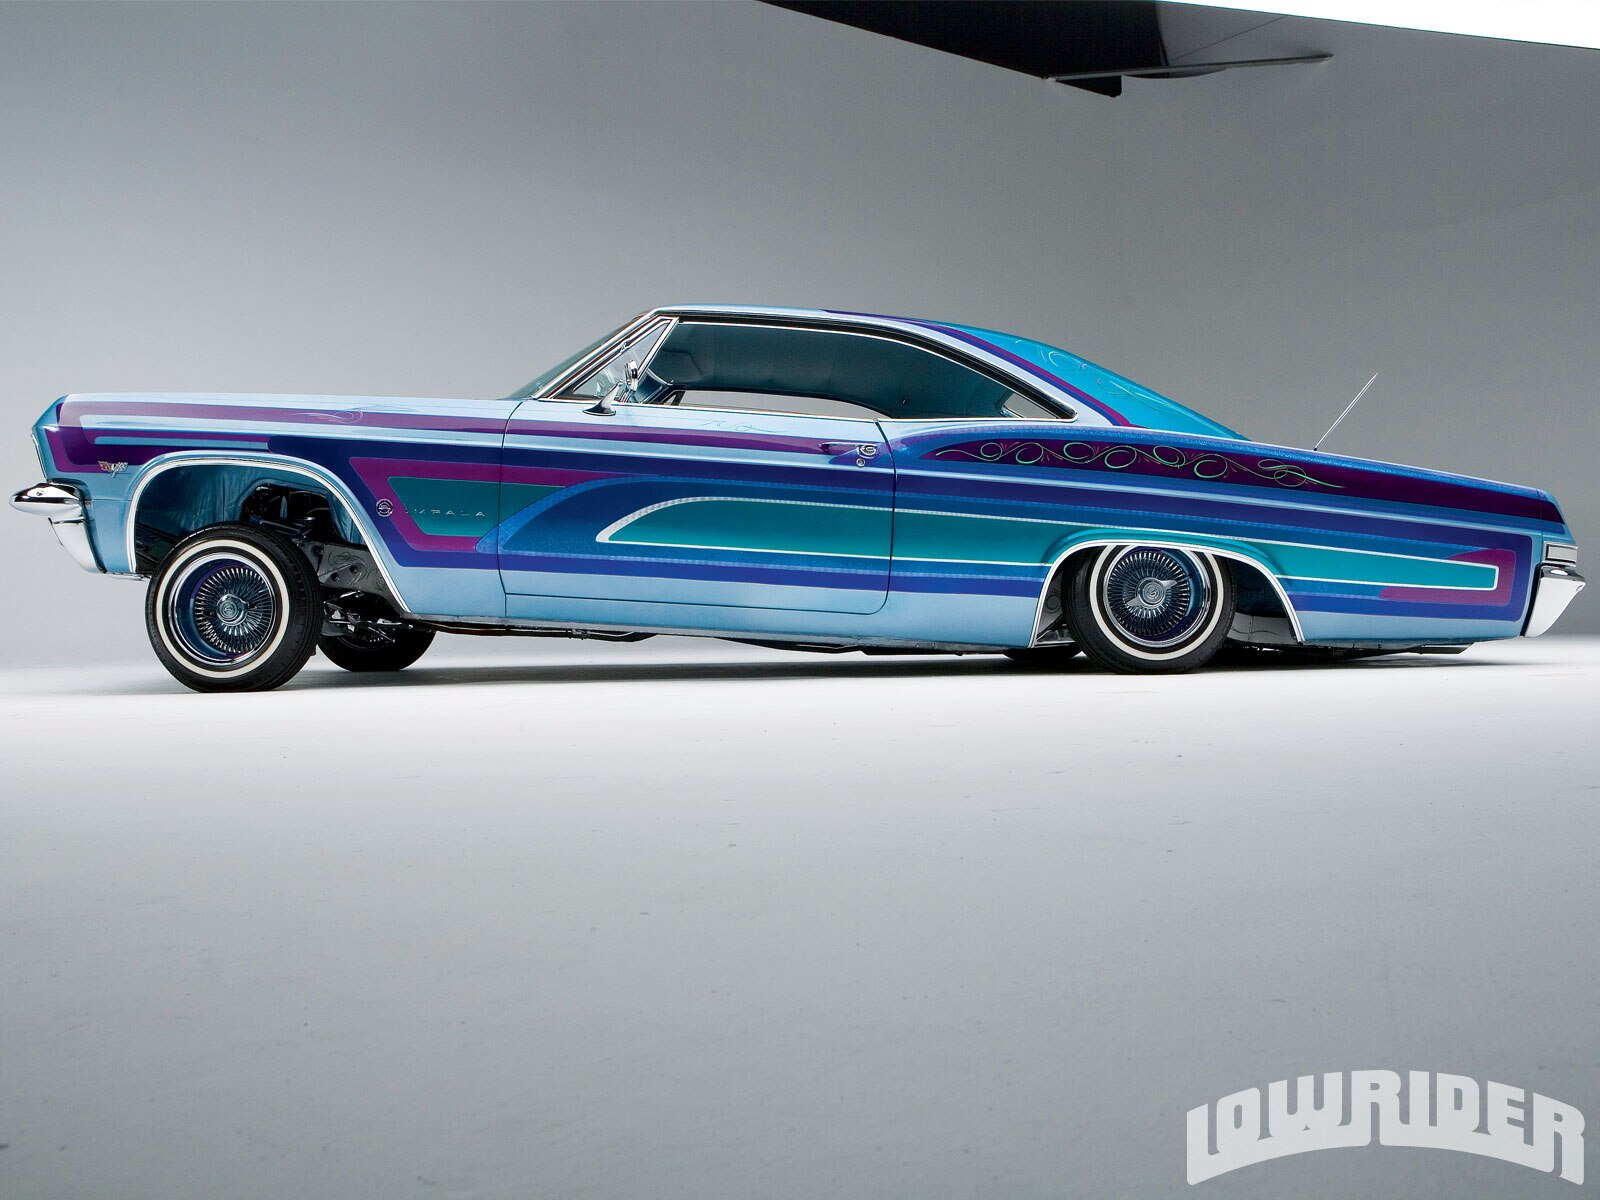 1002-lrmp-03-o-1965-chevrolet-impala-side-view3